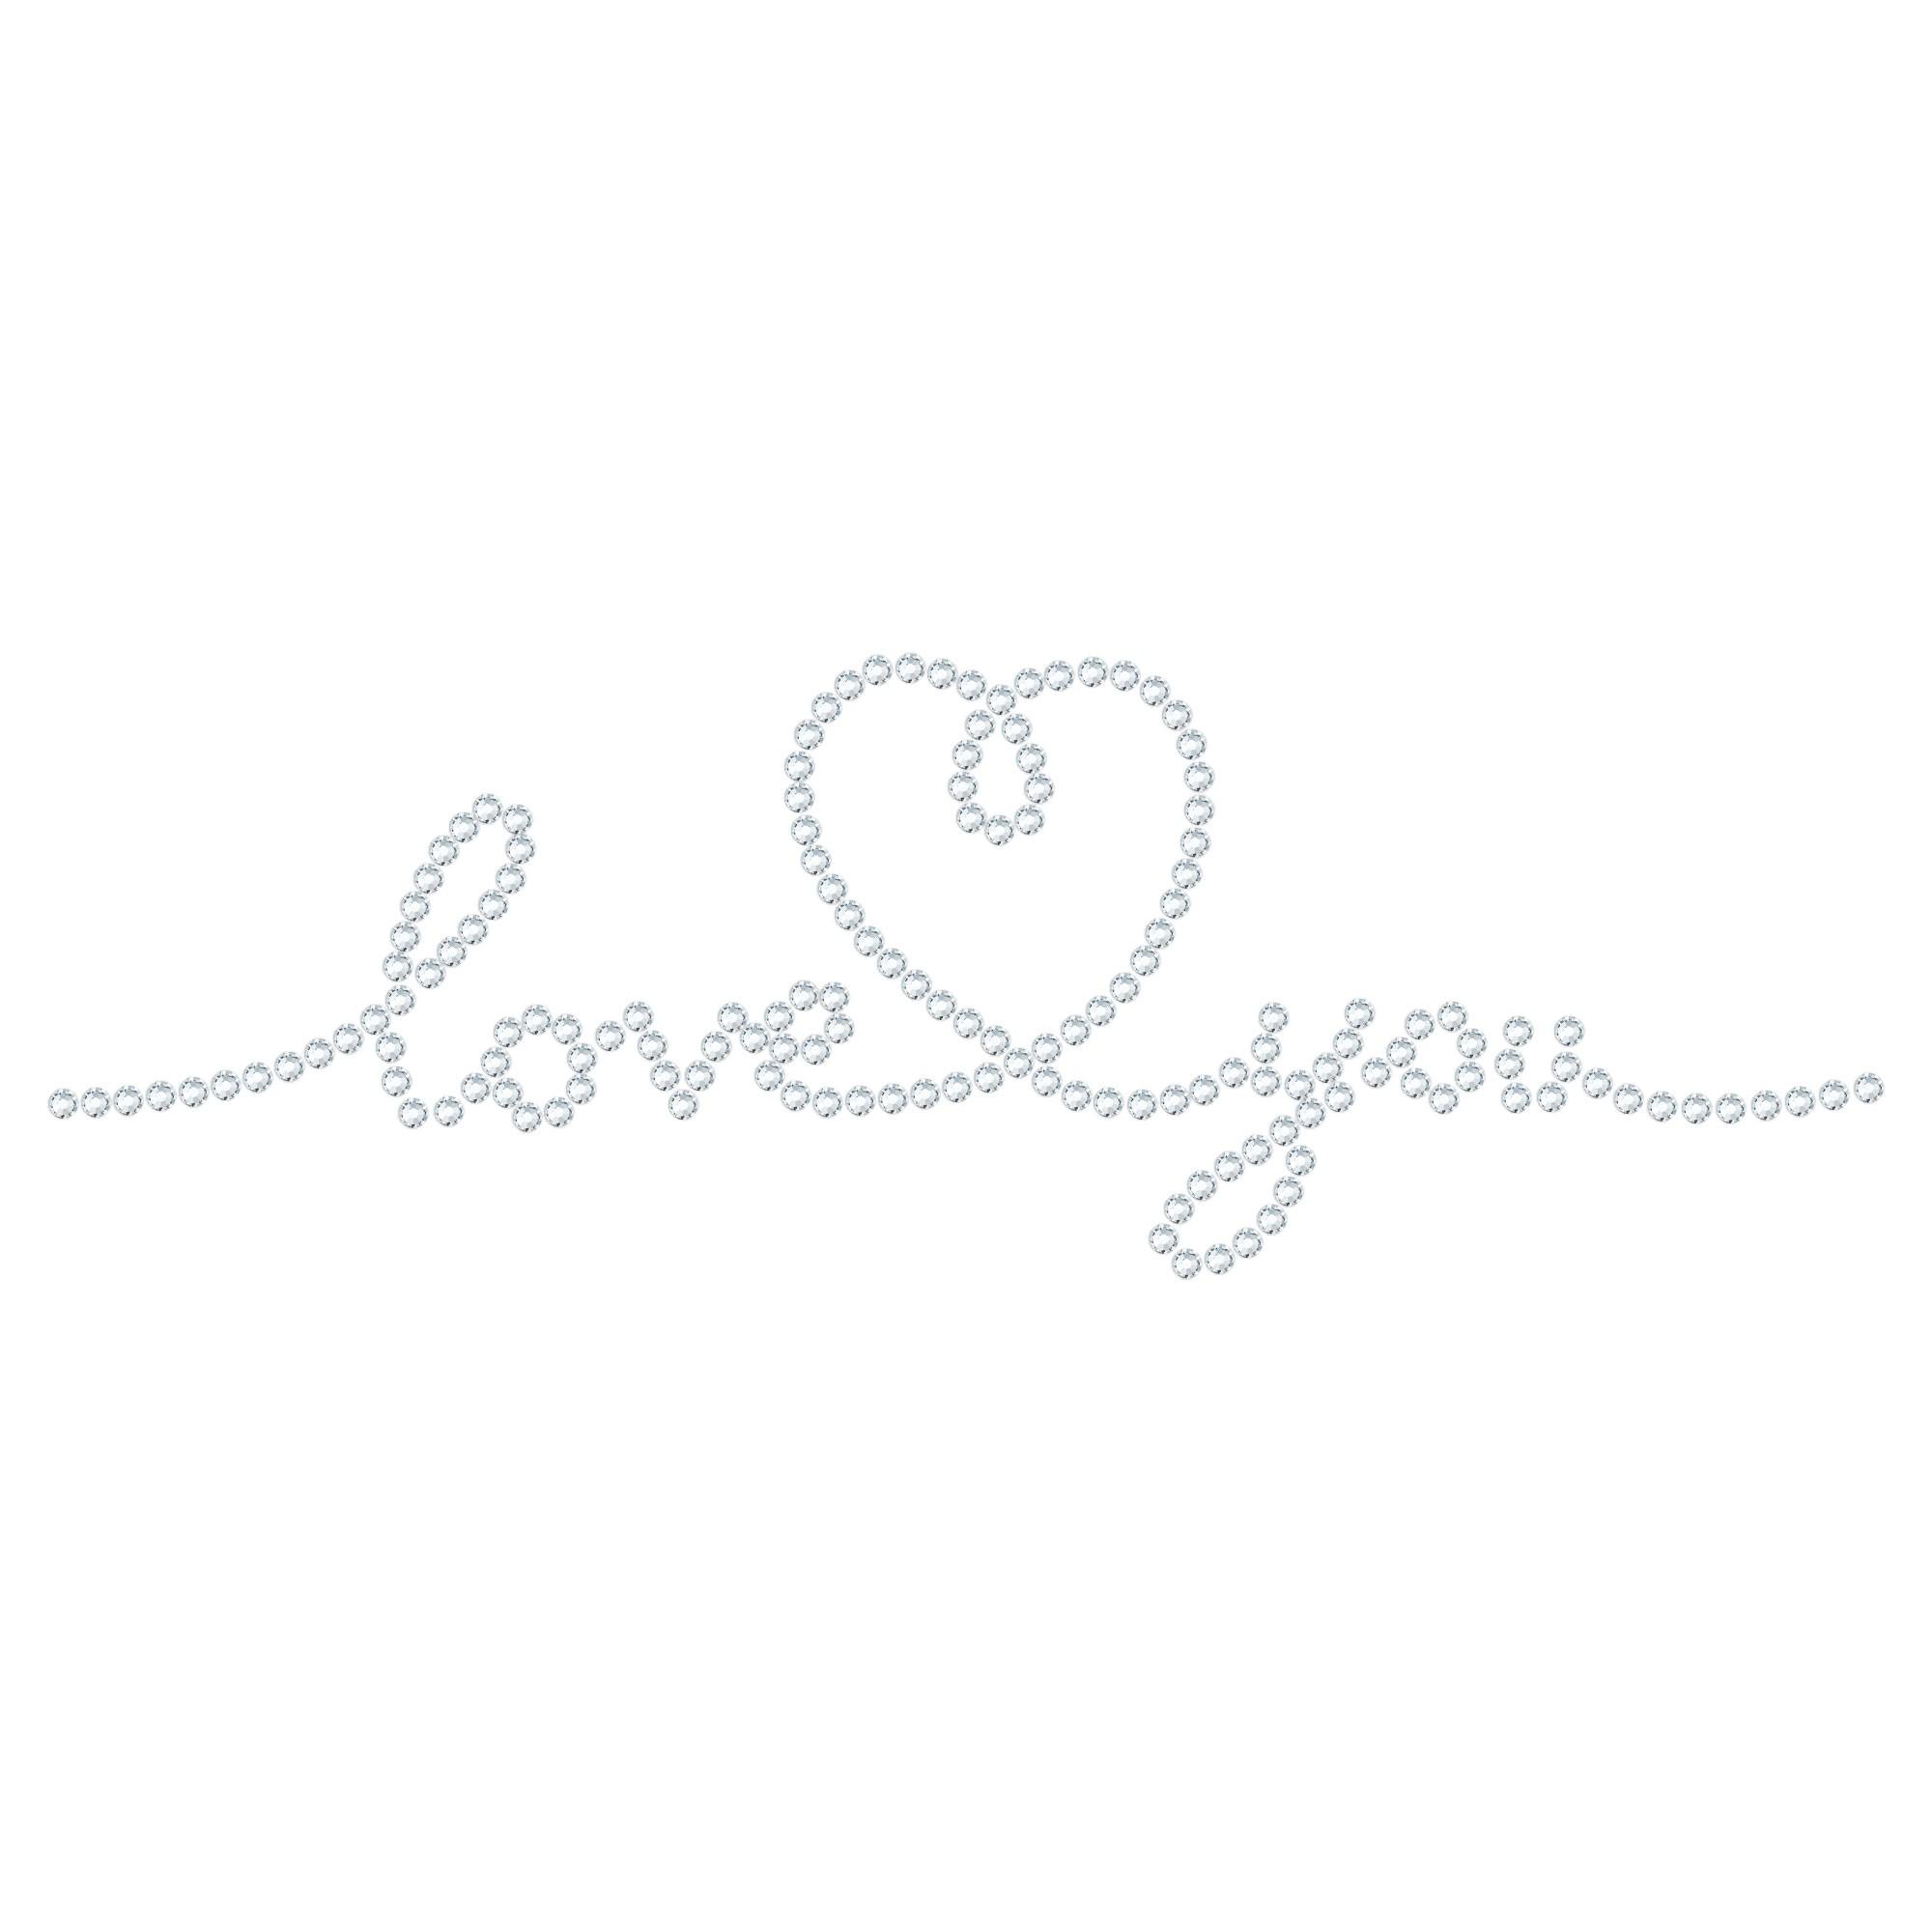 hotfix-rhinestone-transfer-love-you_M60021.AU011_1.jpg